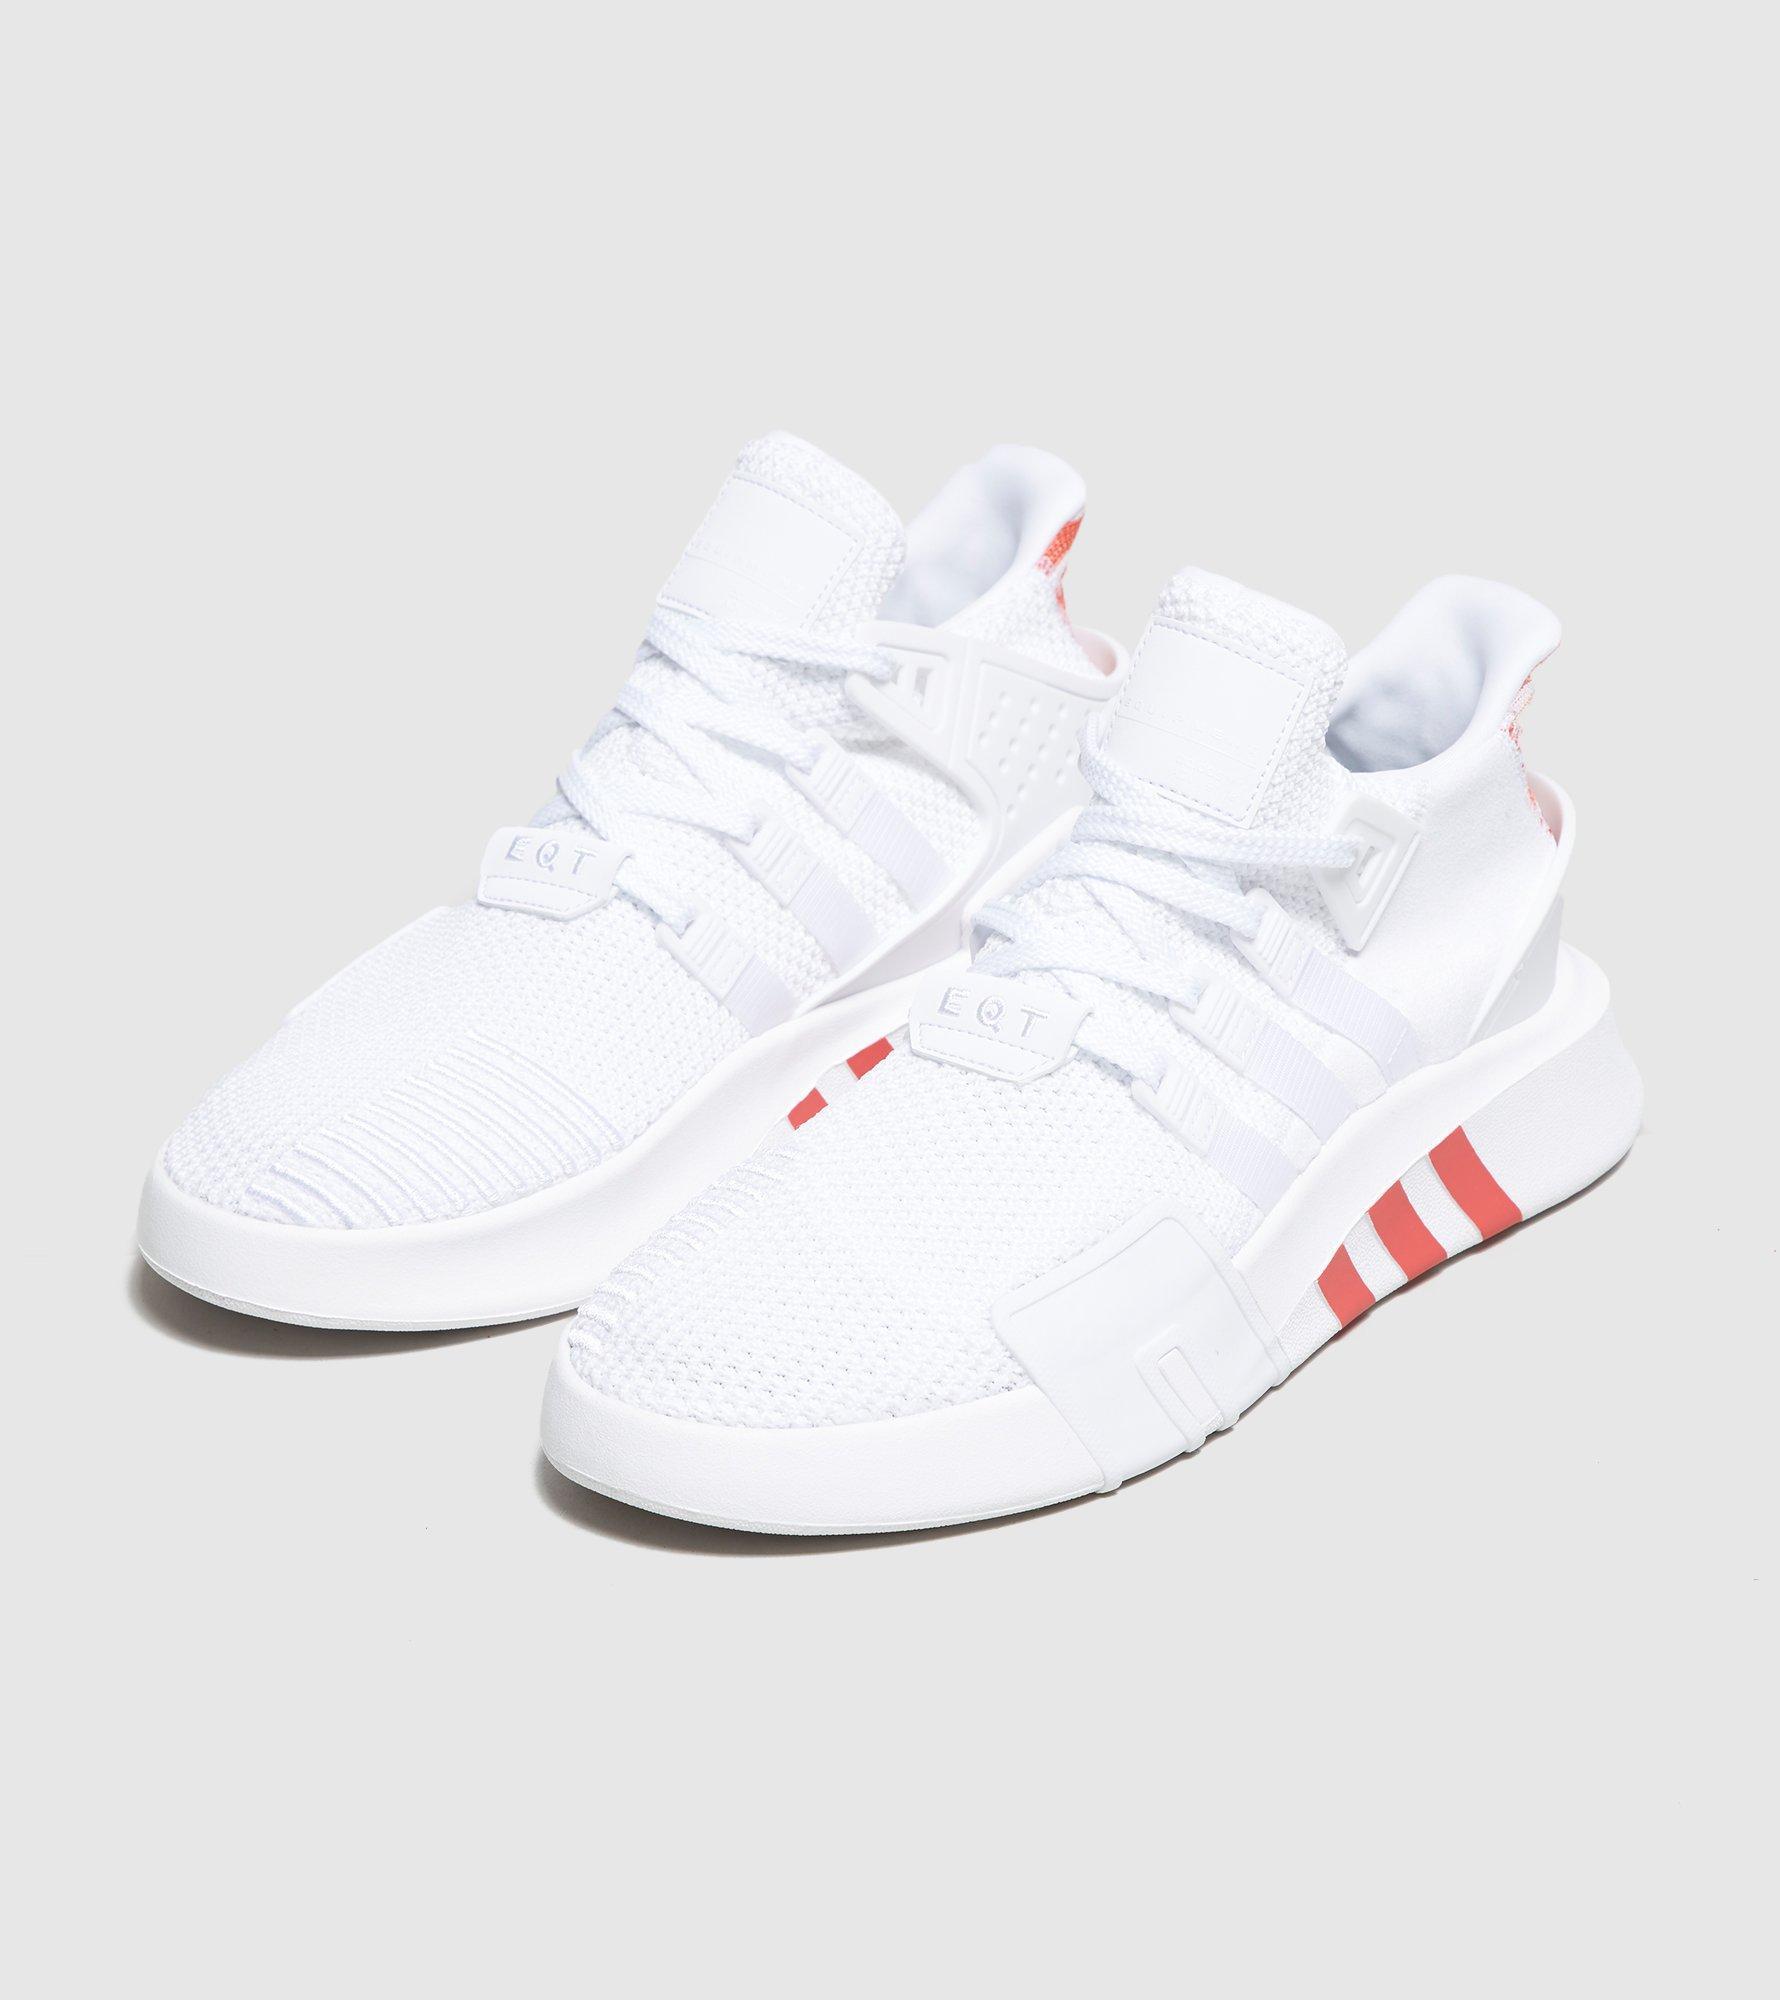 adidas Originals Rubber Eqt Bask Adv in WhiteRed (White